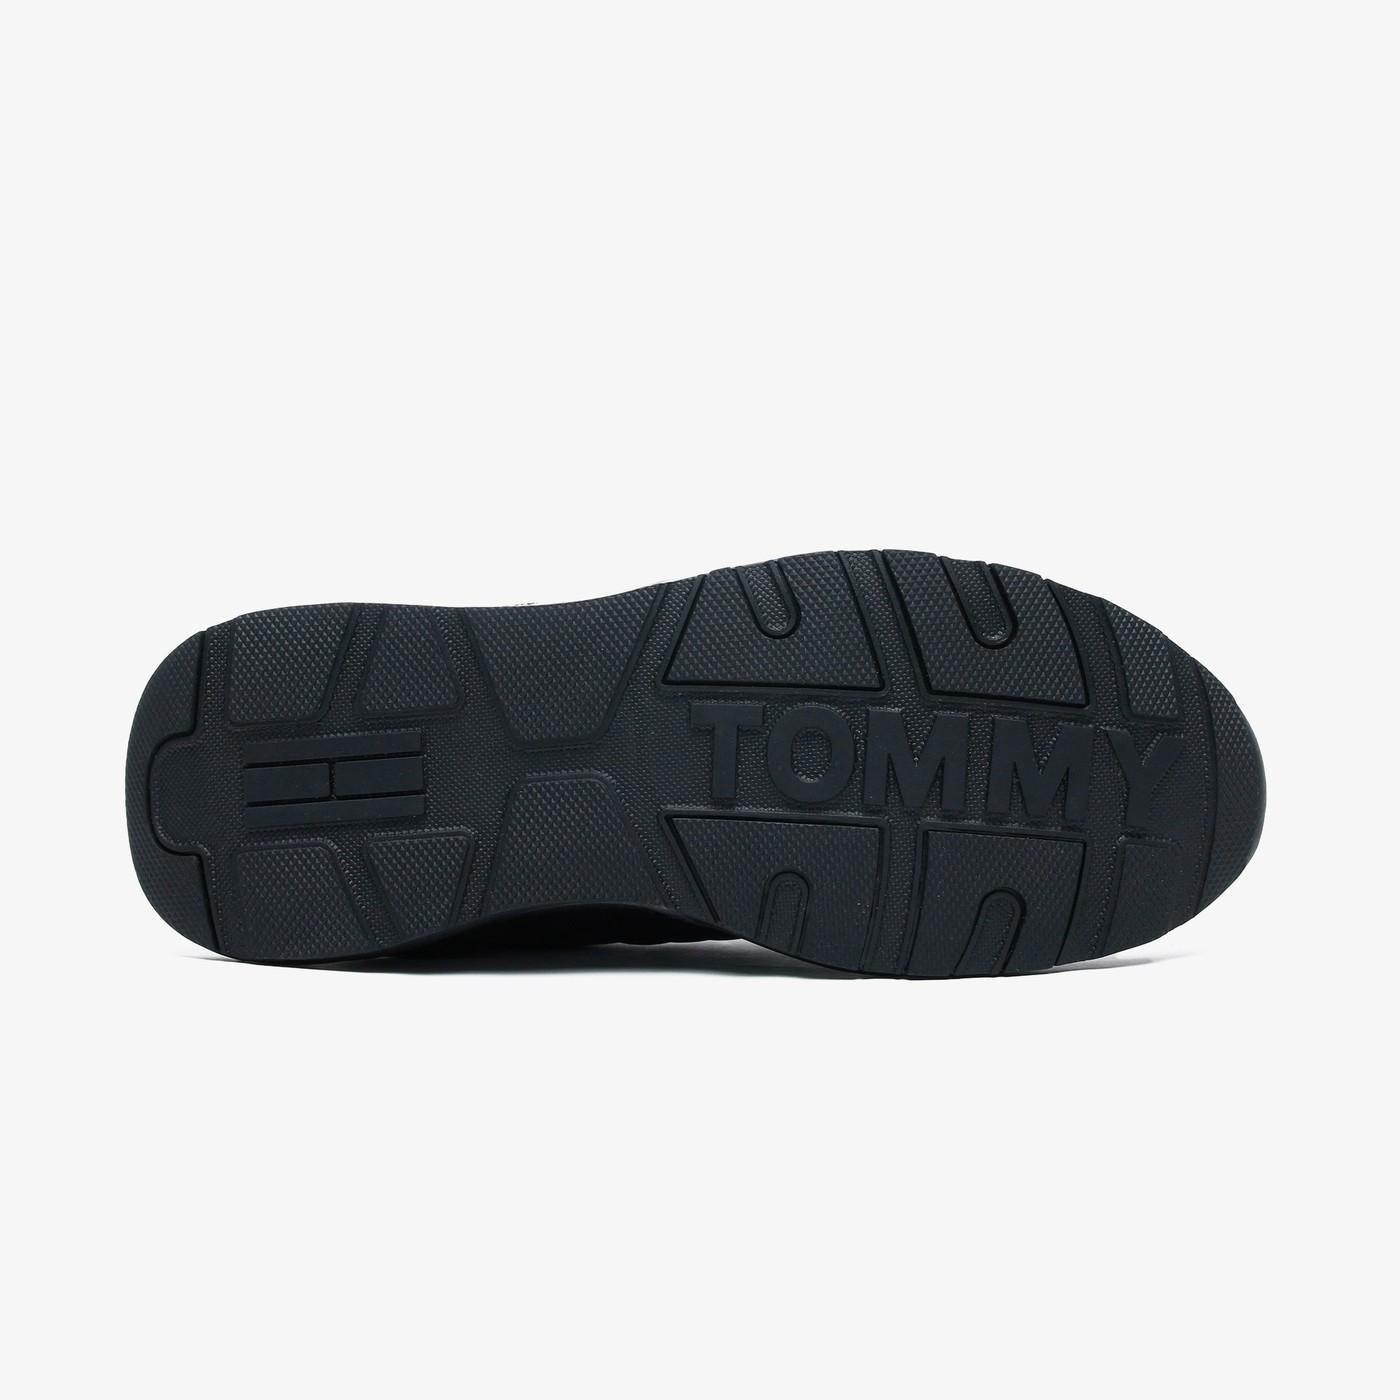 Tommy Hilfiger Chunky Tech Erkek Siyah Spor Ayakkabı